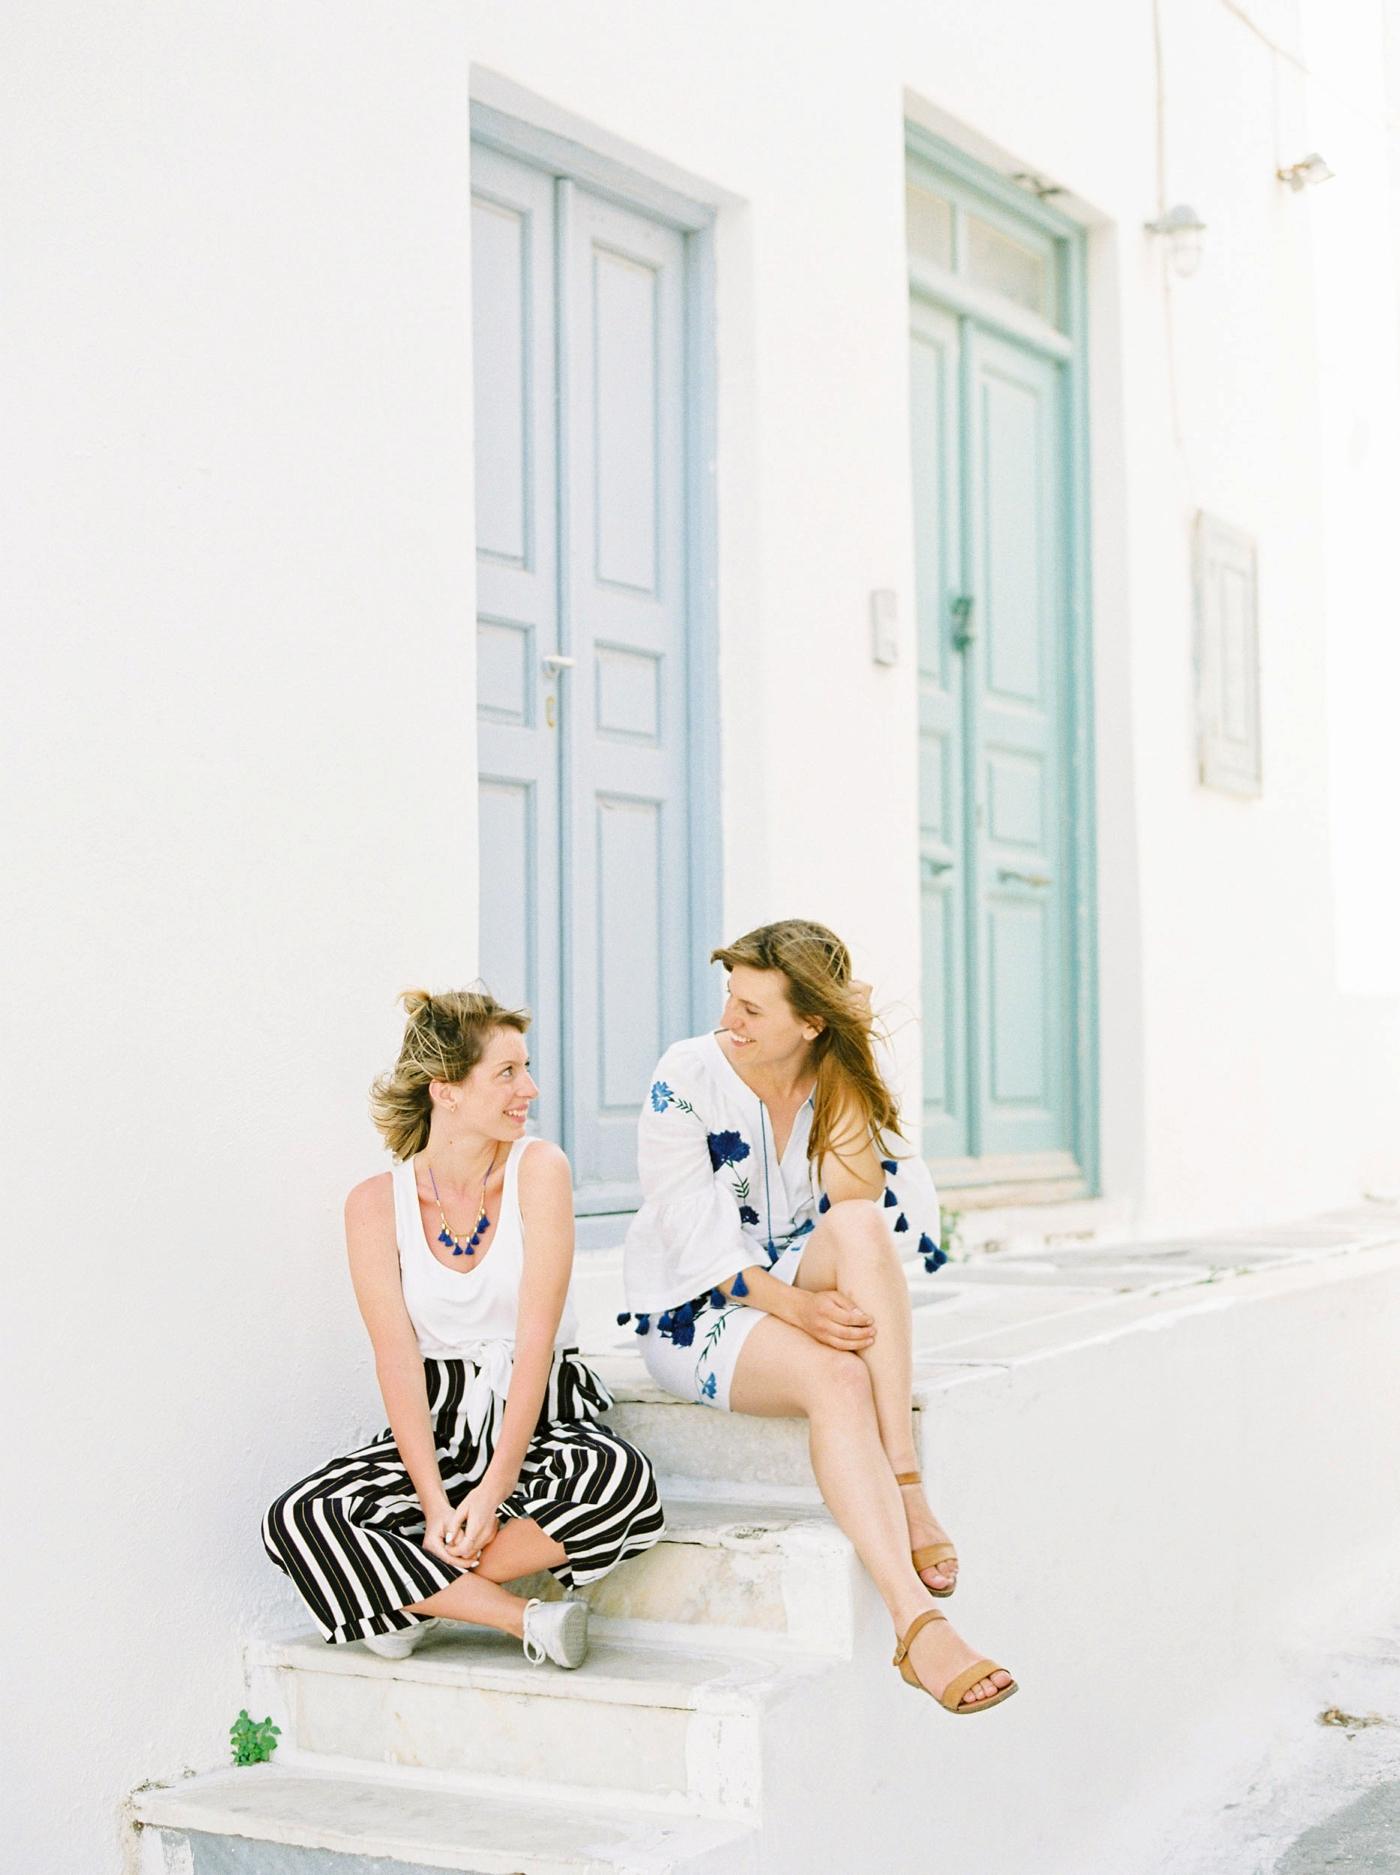 Mykonos wedding photographer | destination fashion blogger and photographers | fine art film photography Justine Milton and Life Set Sail